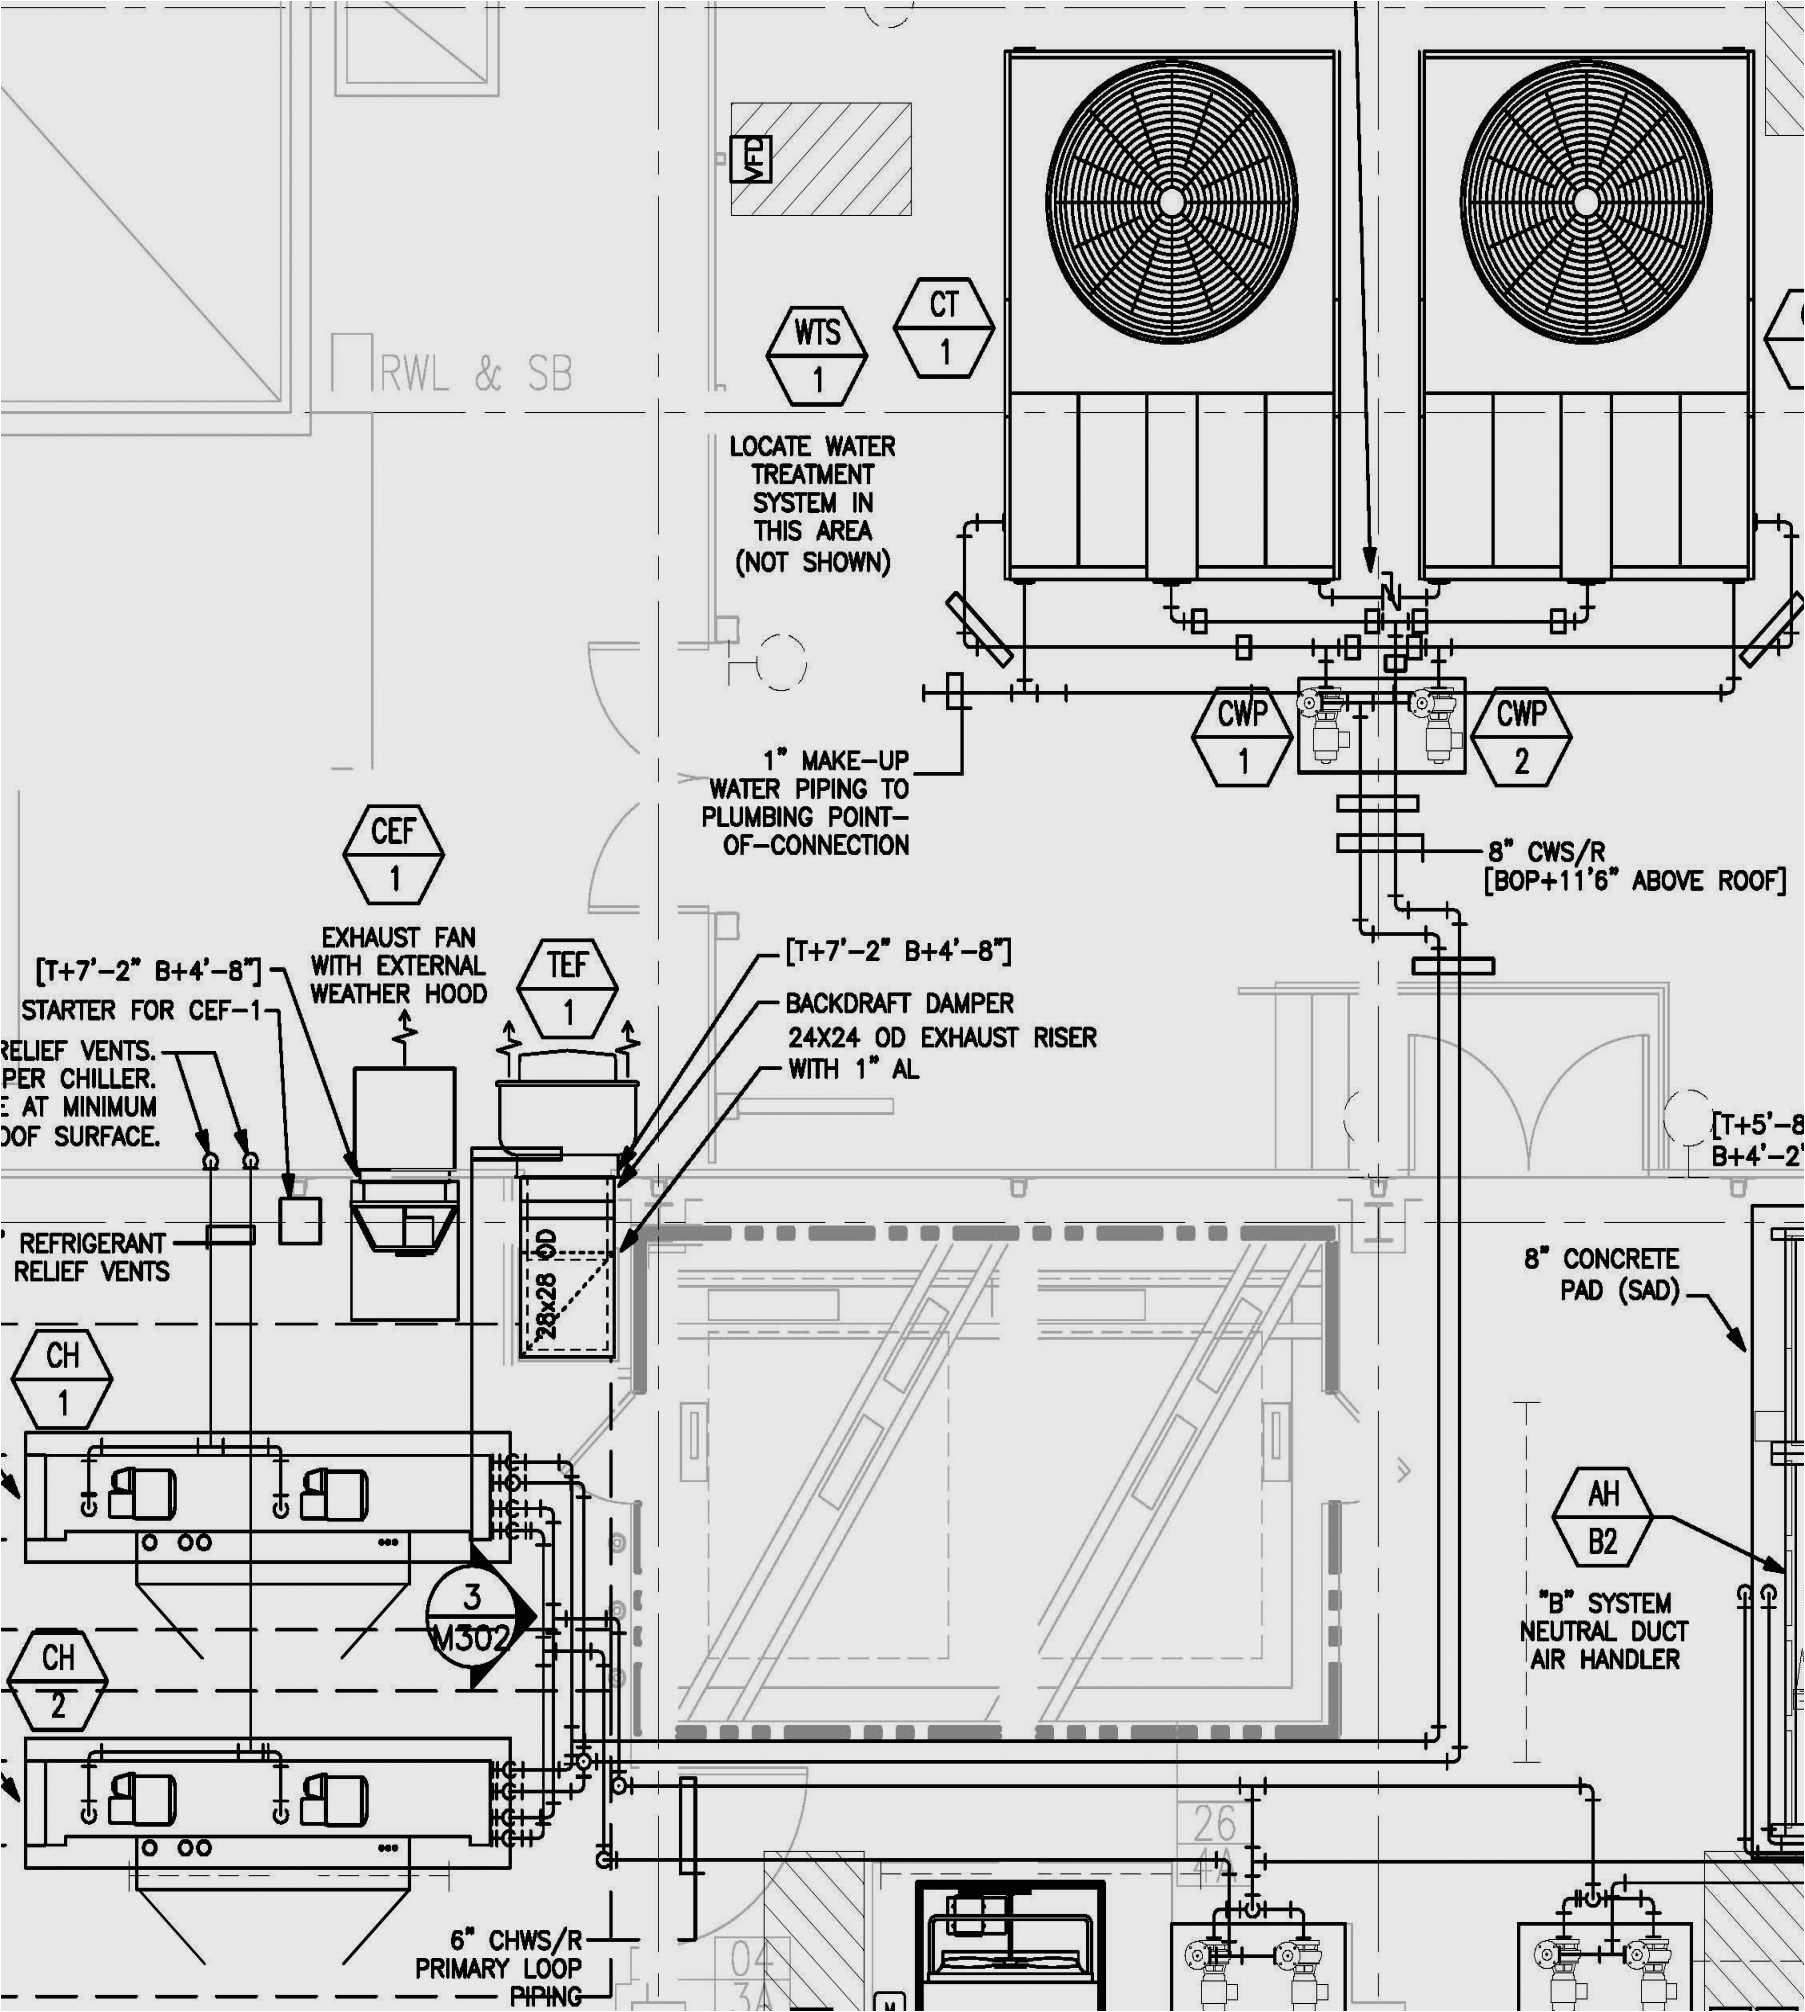 36 volt ez go golf cart wiring diagram 2018 ez go wiring diagram 36 rh citruscyclecenter